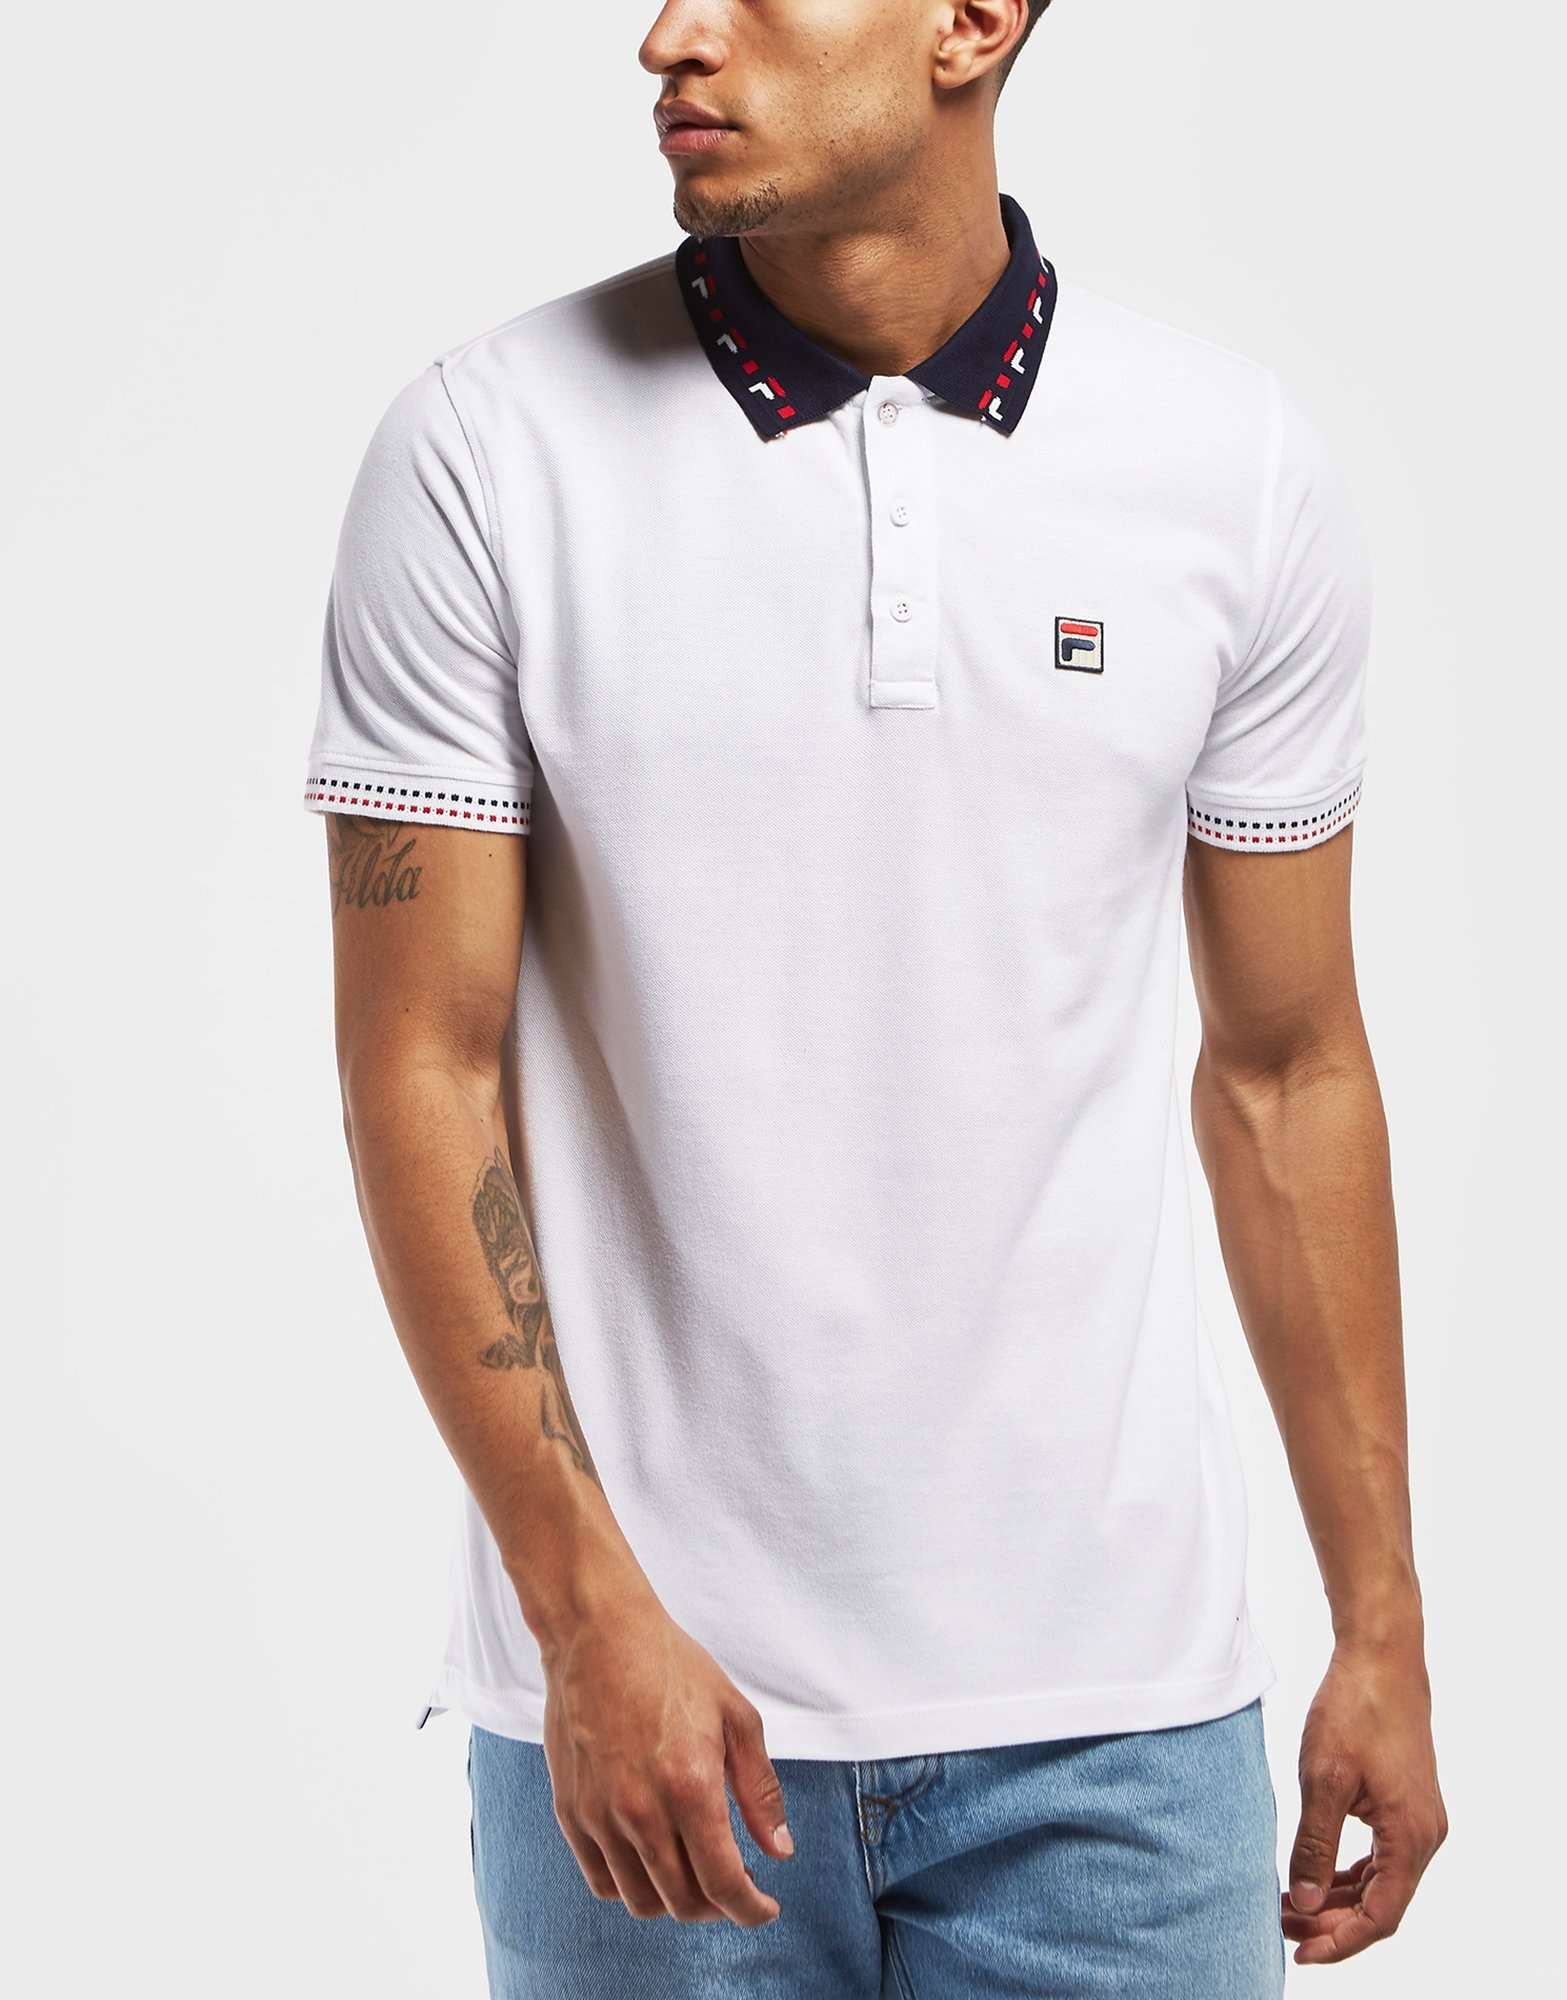 Fila Castagna Short Sleeve Polo Shirt - Exclusive